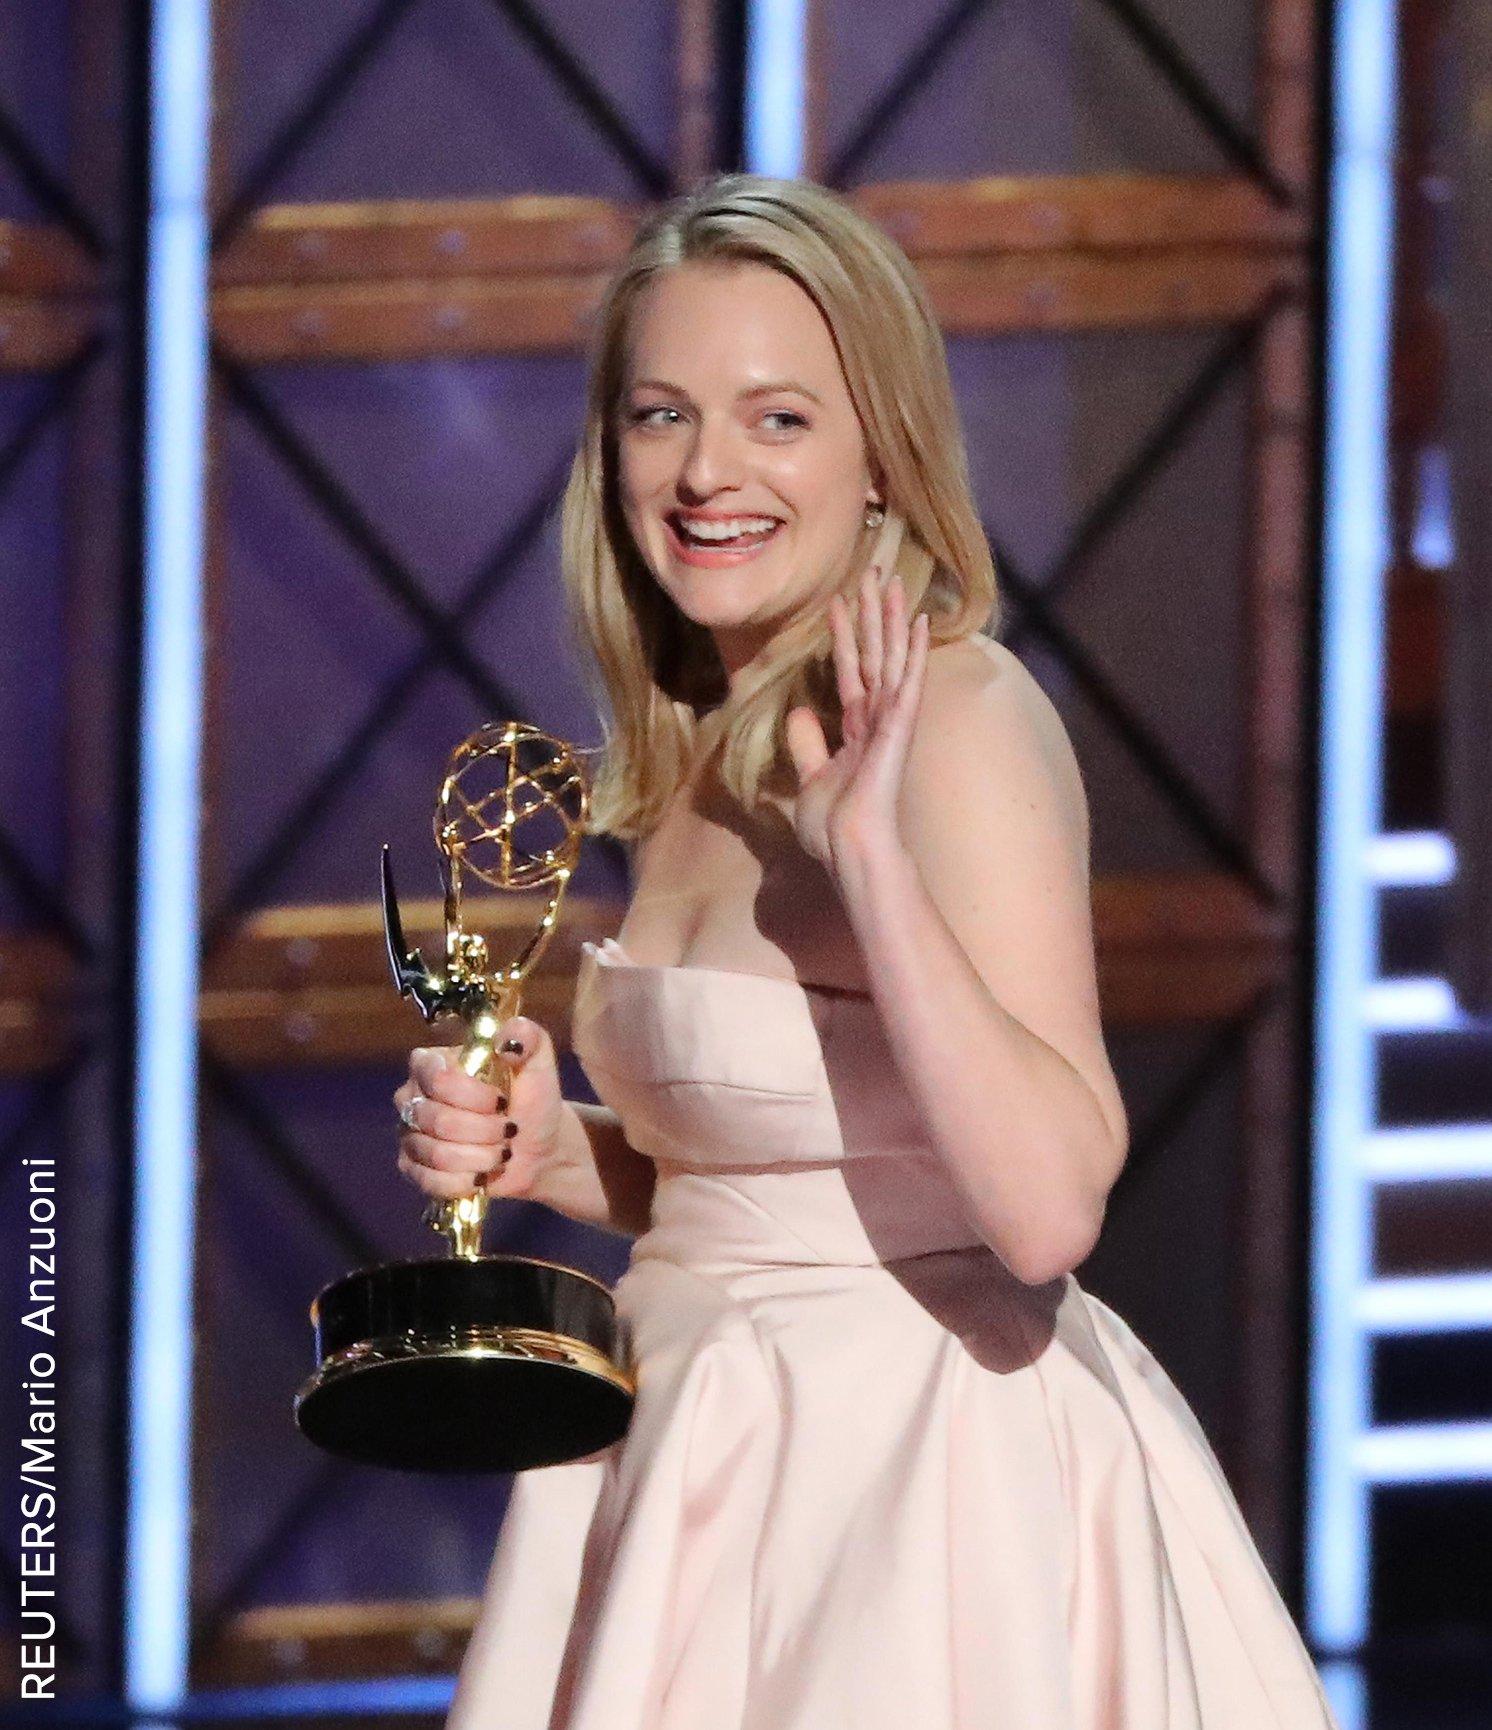 Elisabeth Moss laughs off expletive-laden #Emmys speech. 'That was the clean version.' https://t.co/VRl9c3uEjD https://t.co/Djbjb7FGm4